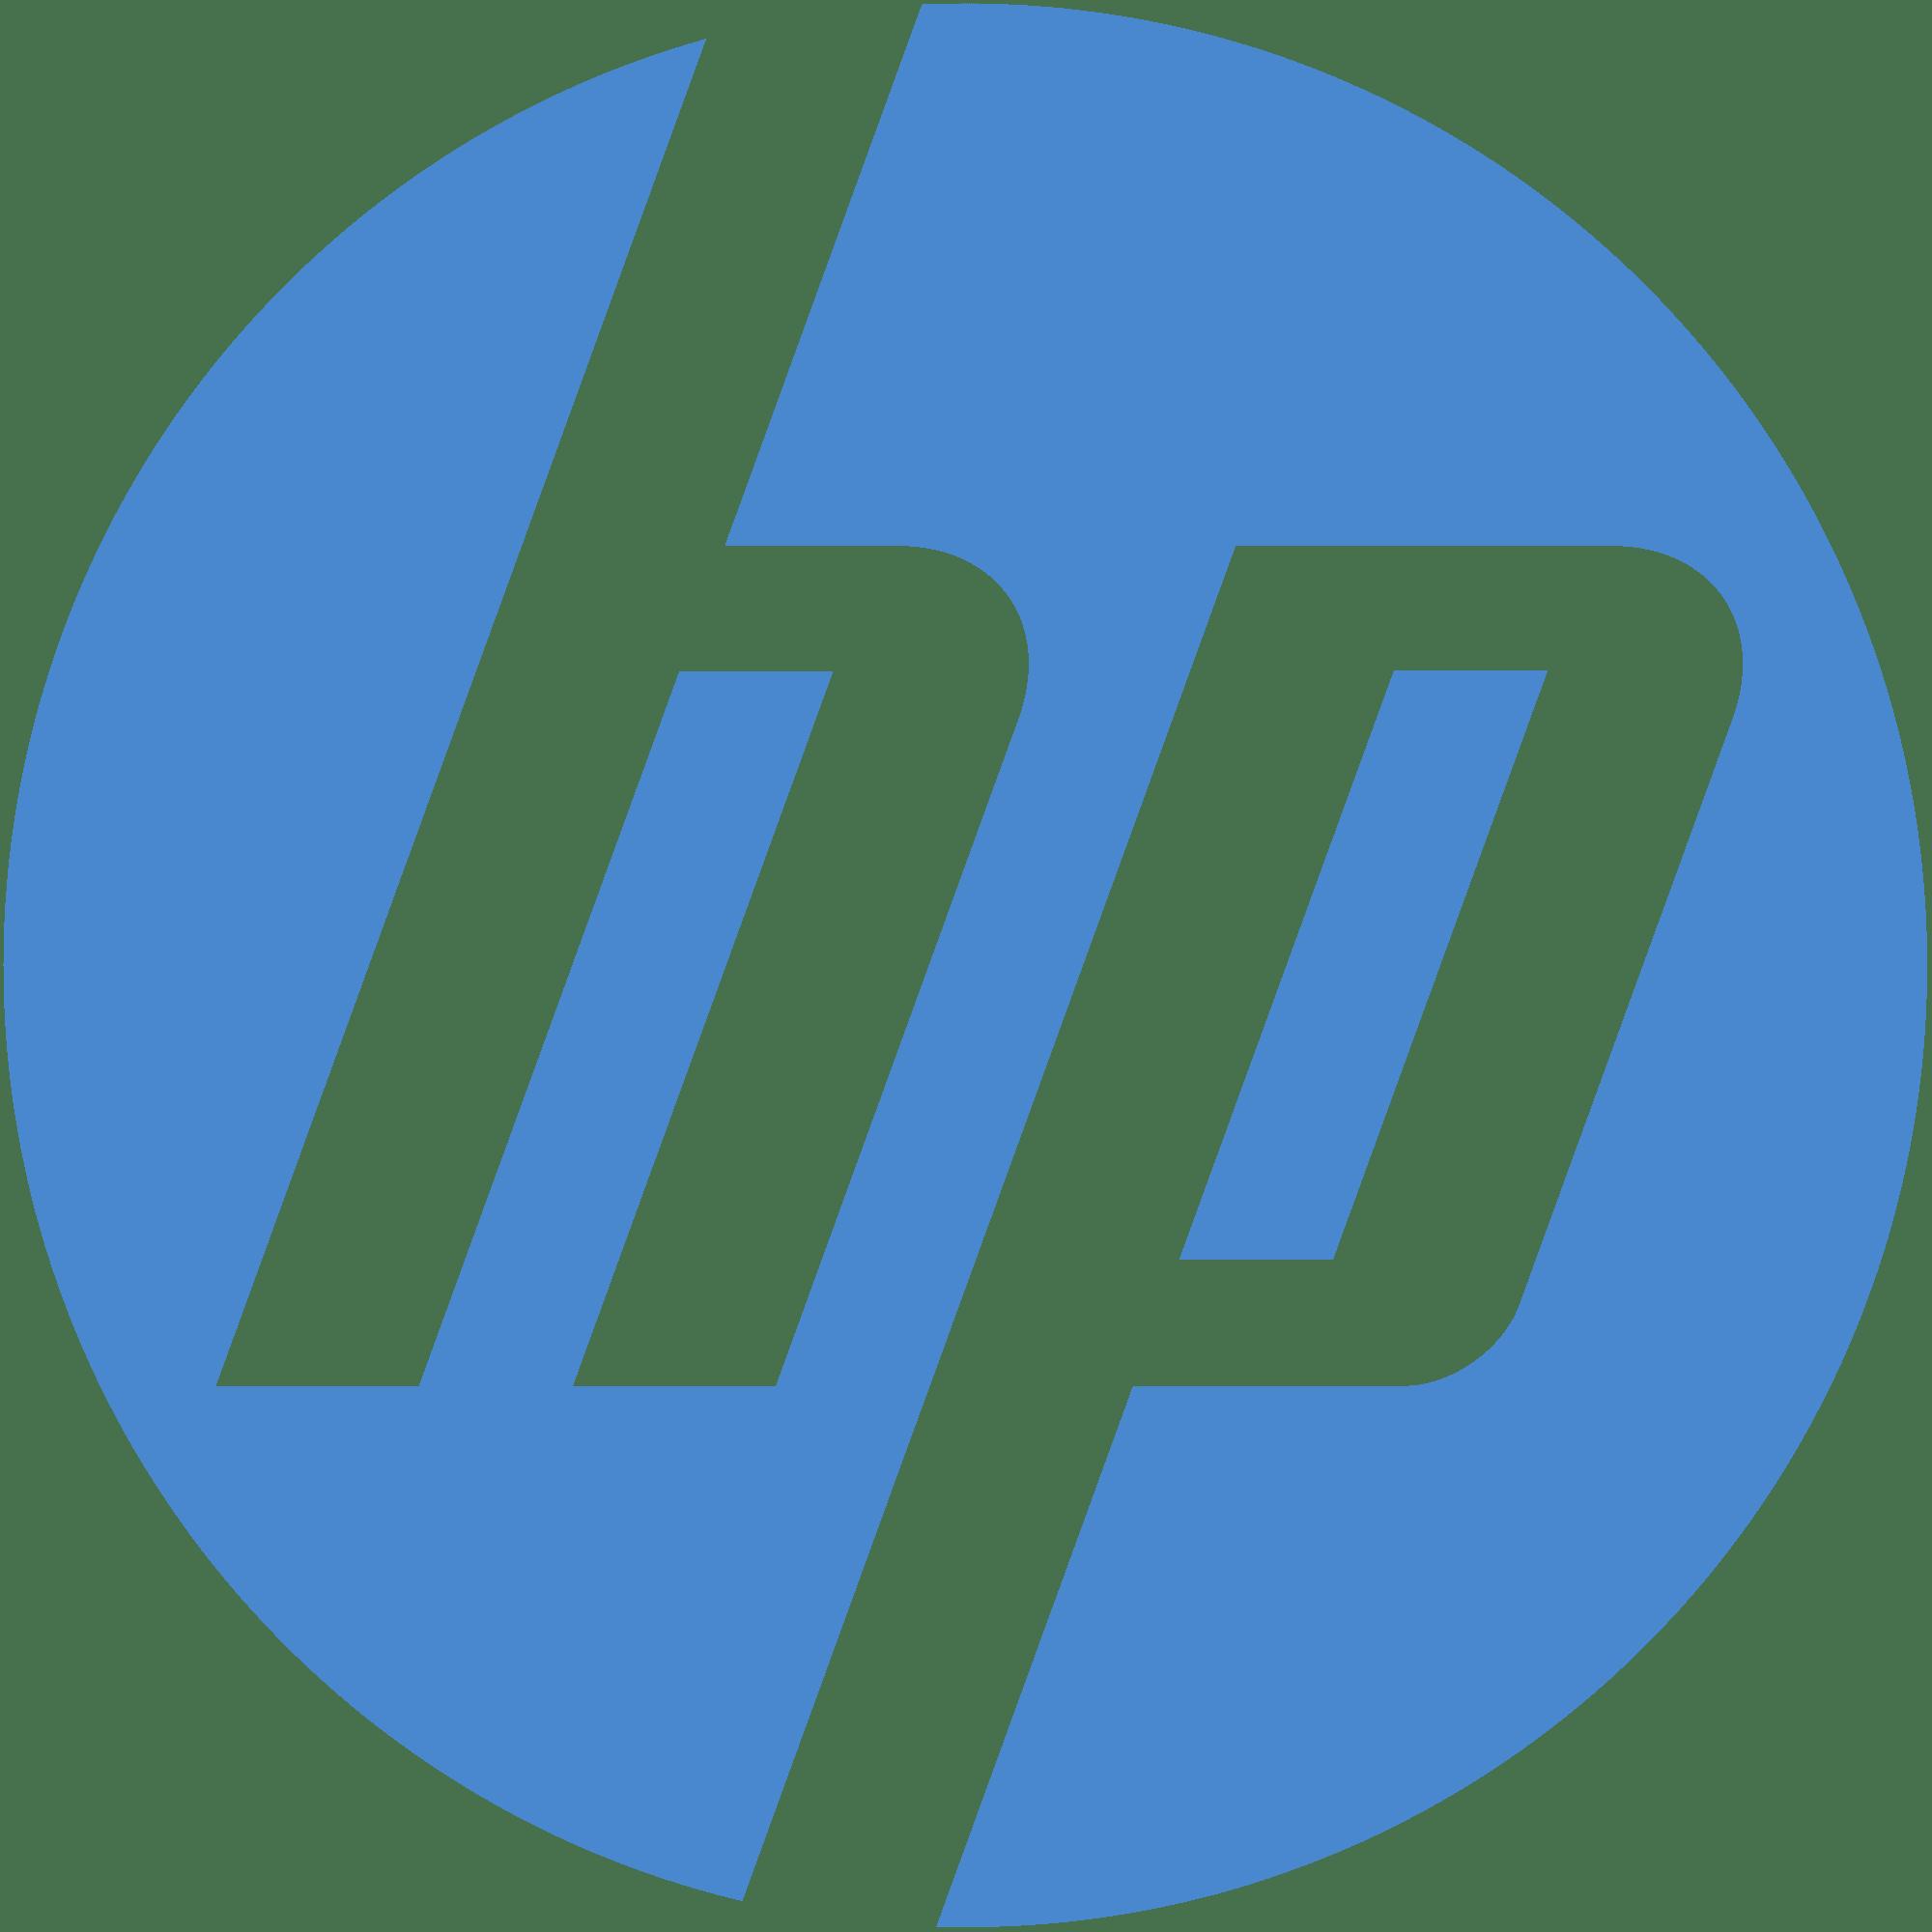 HP ENVY 5660 Printer Driver